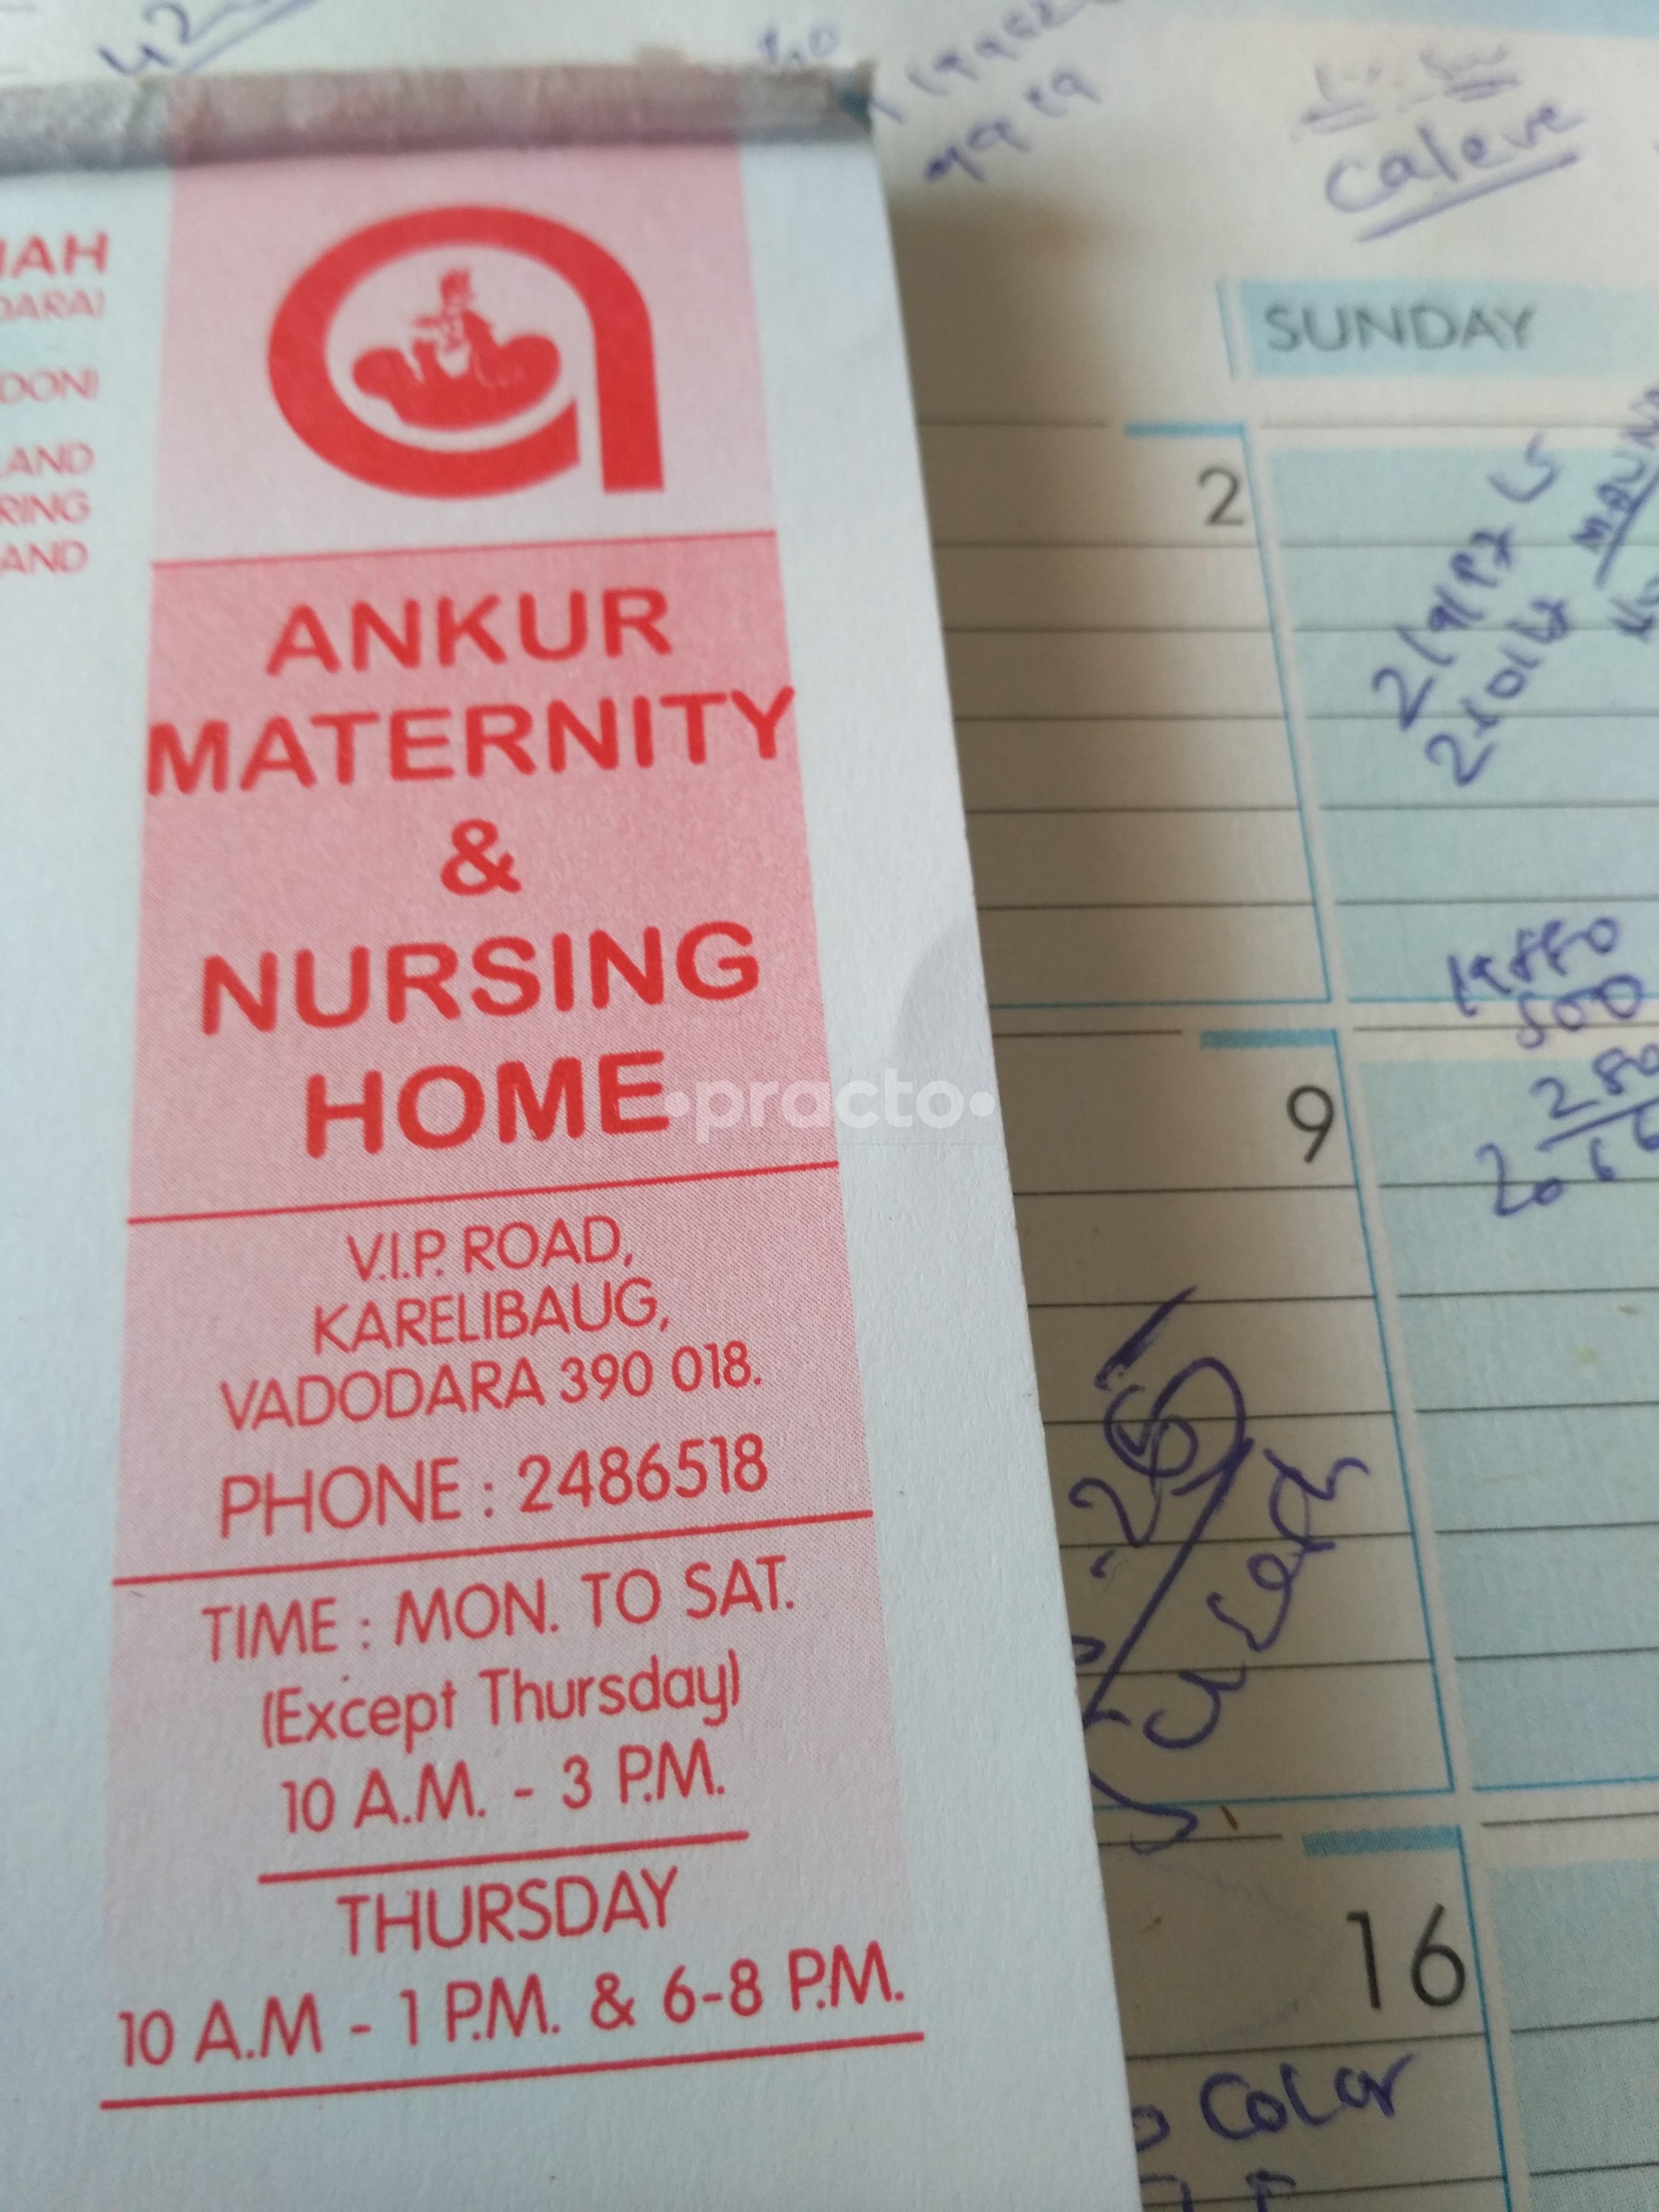 Ankur maternity hospital. display image